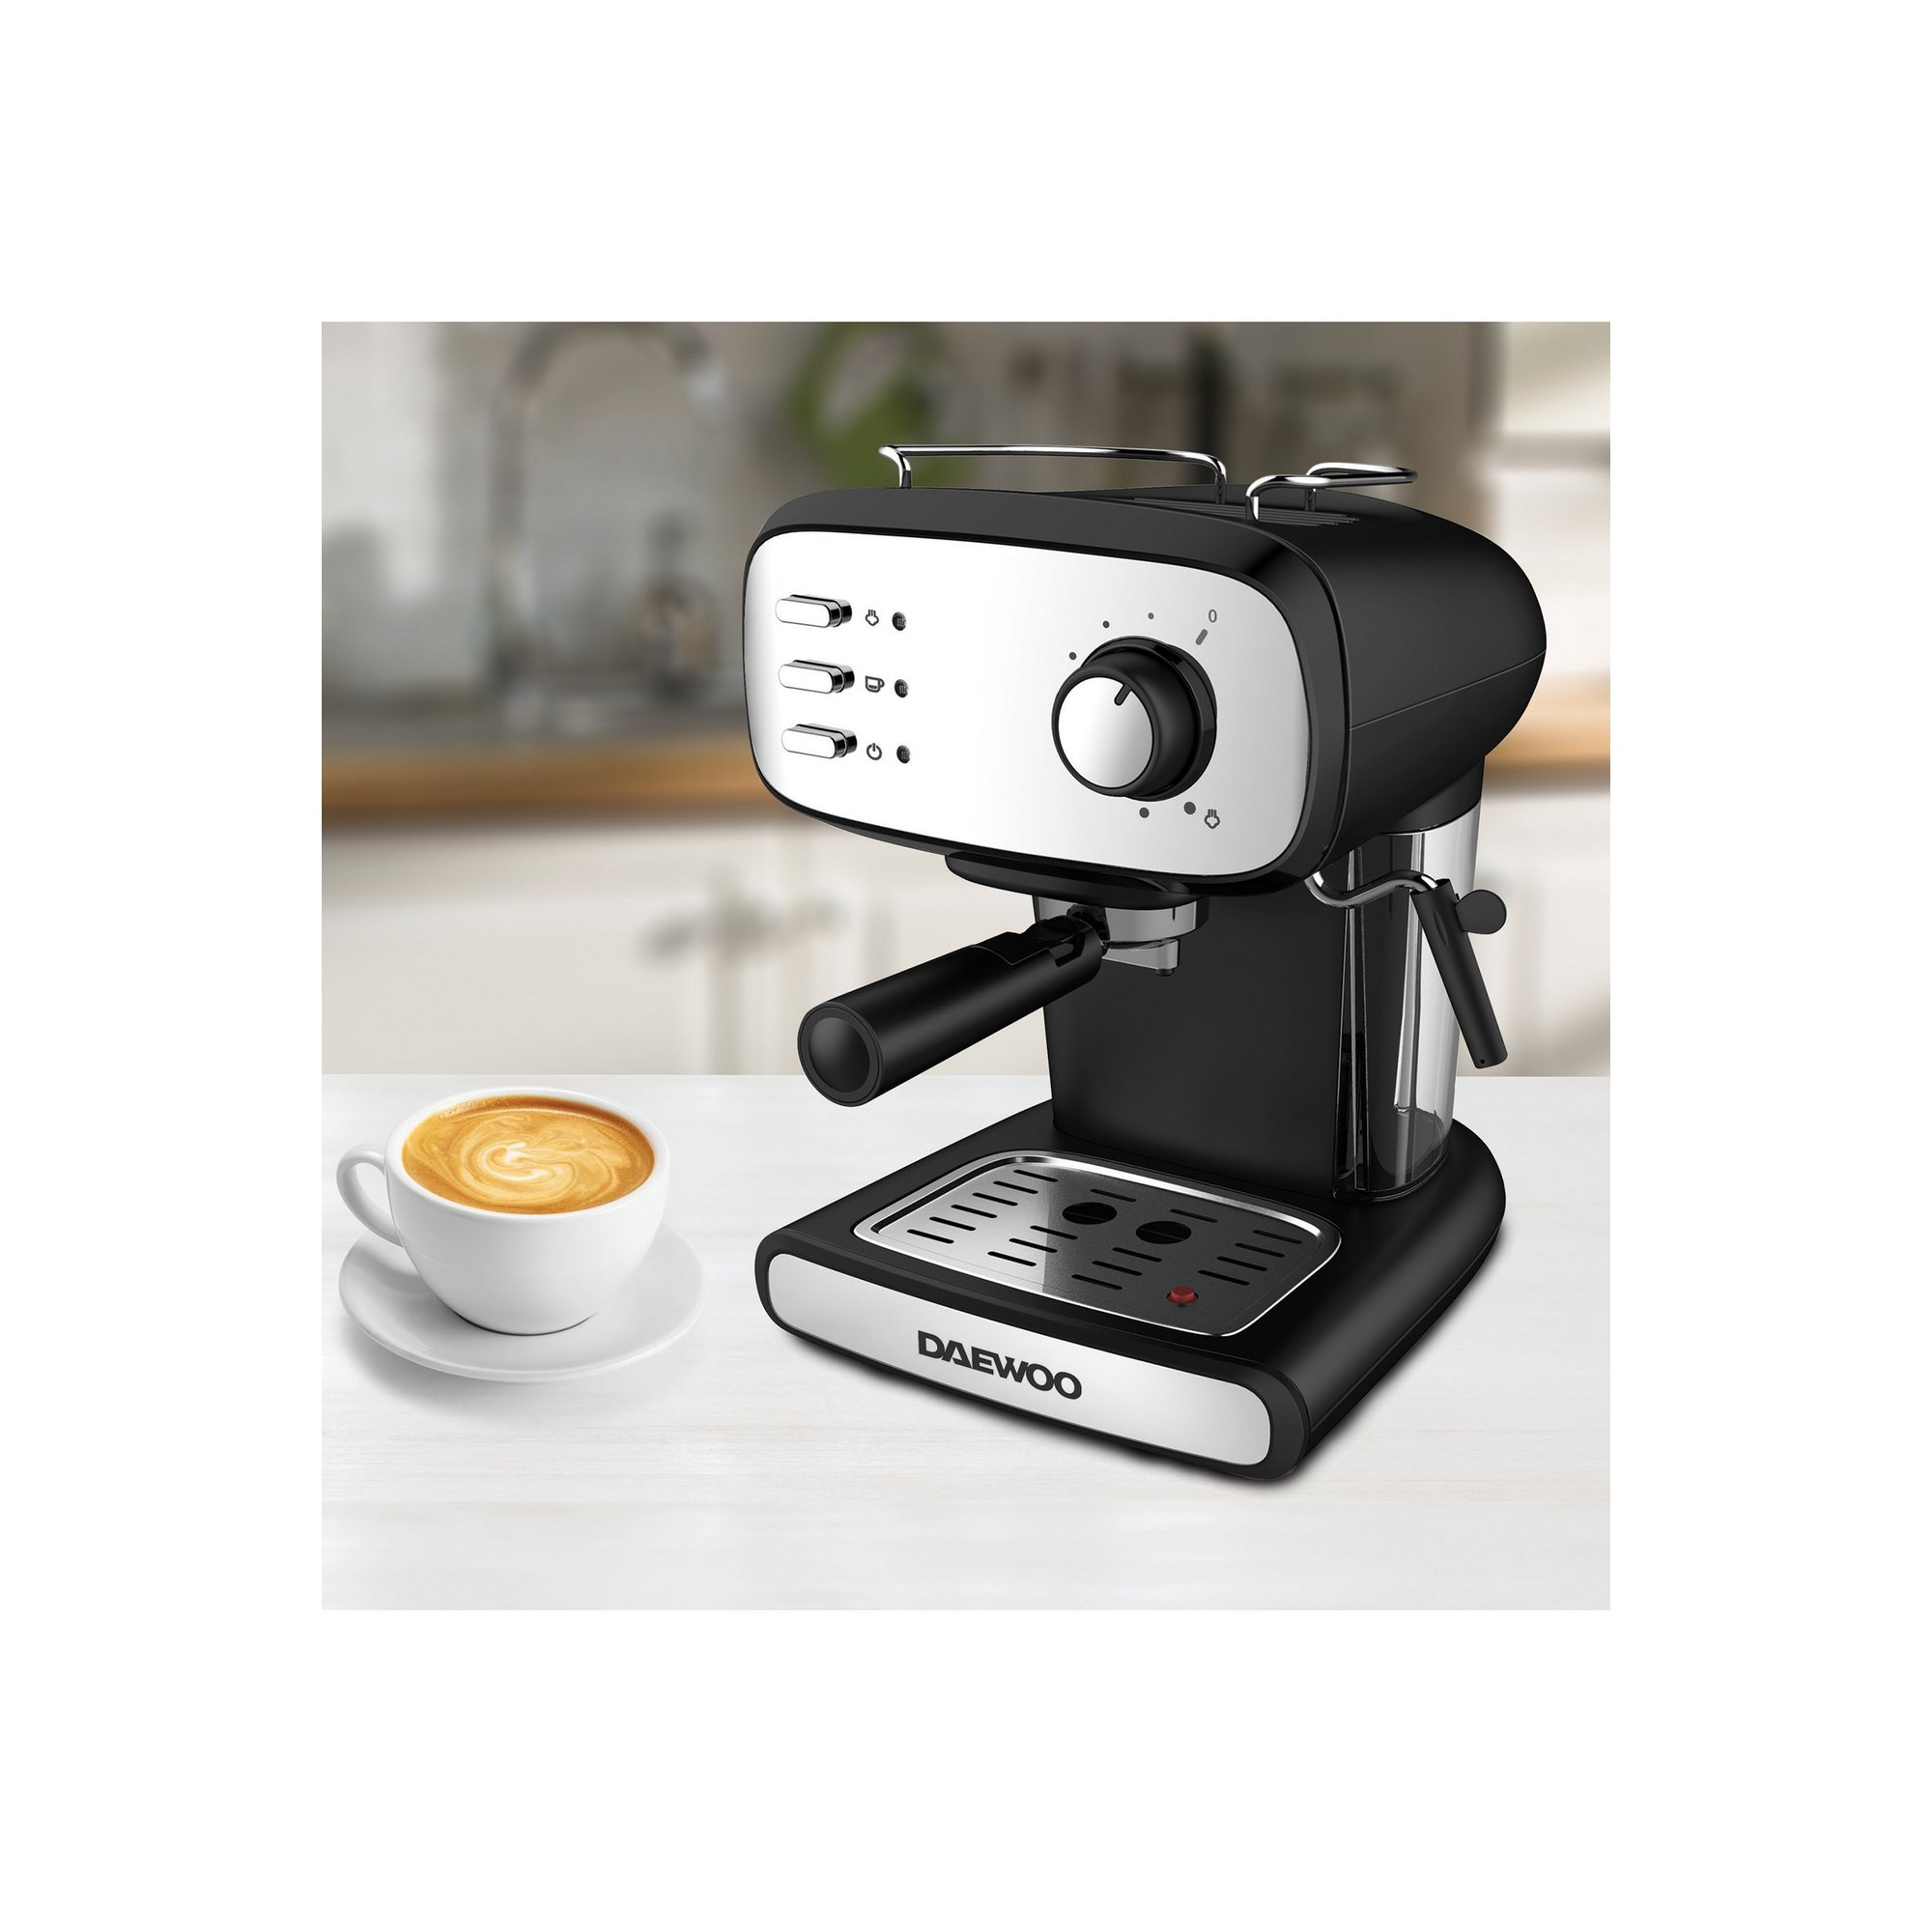 Image of Daewoo Espresso Coffee Machine